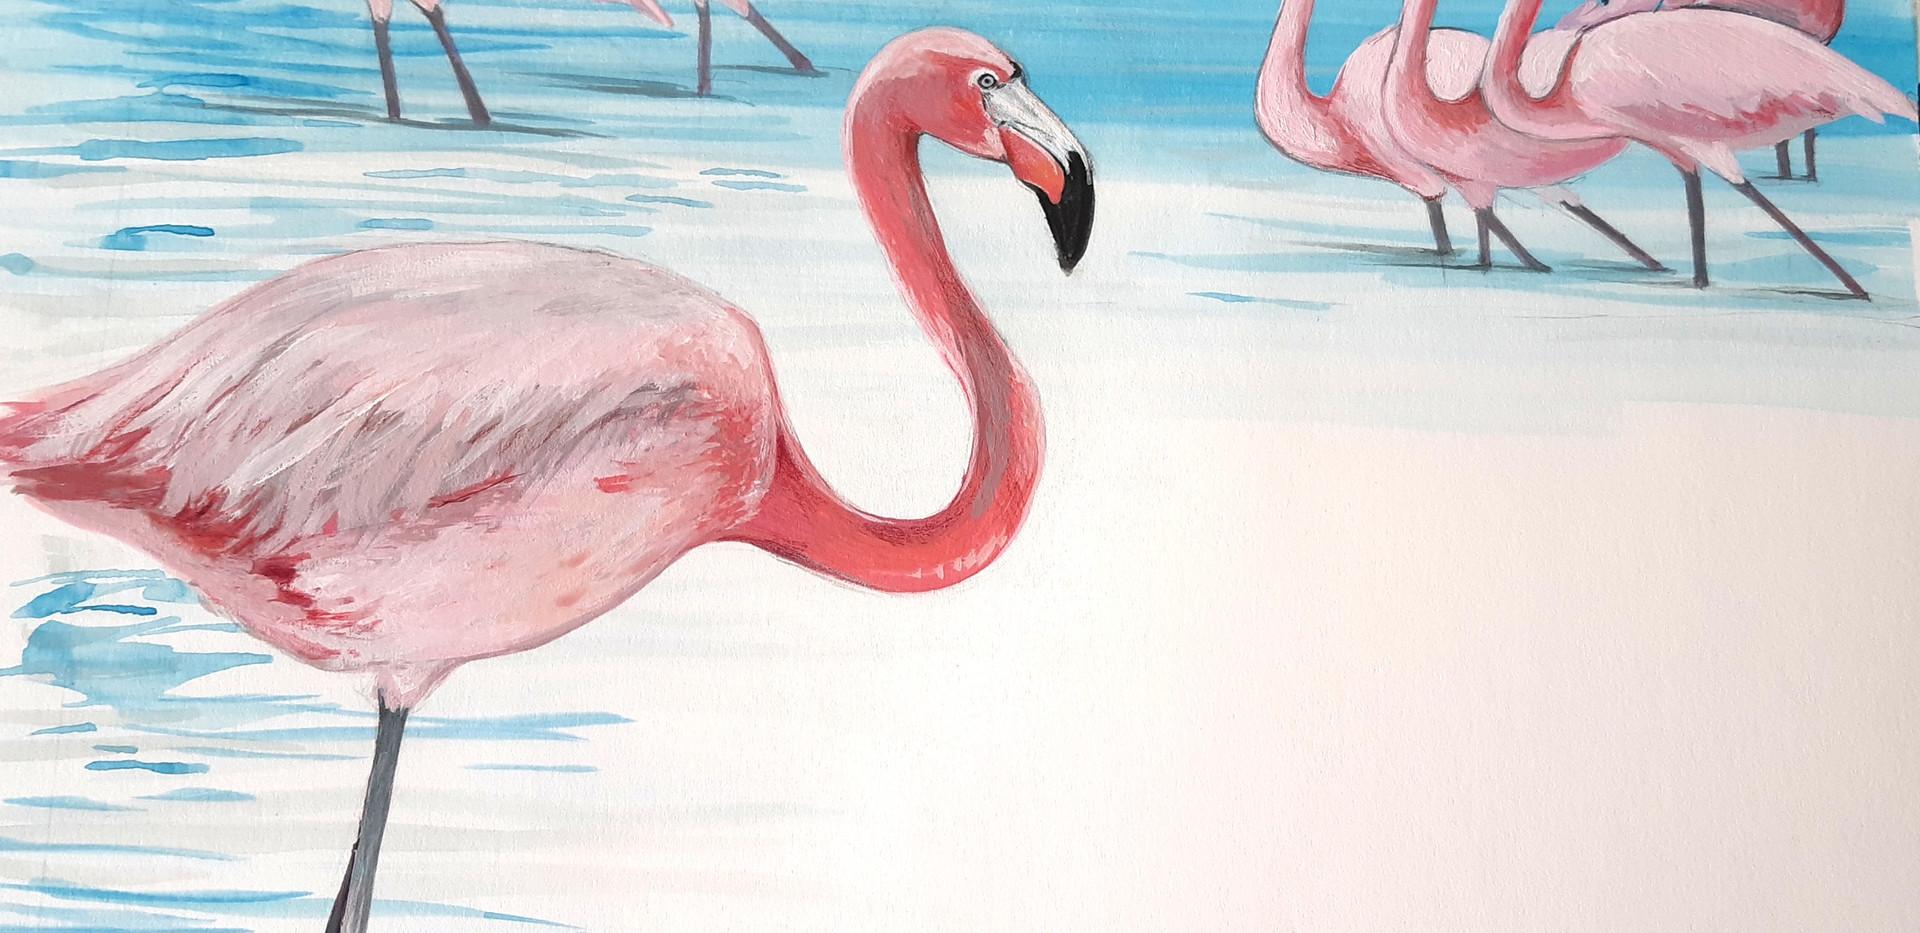 Flamingoes illustration